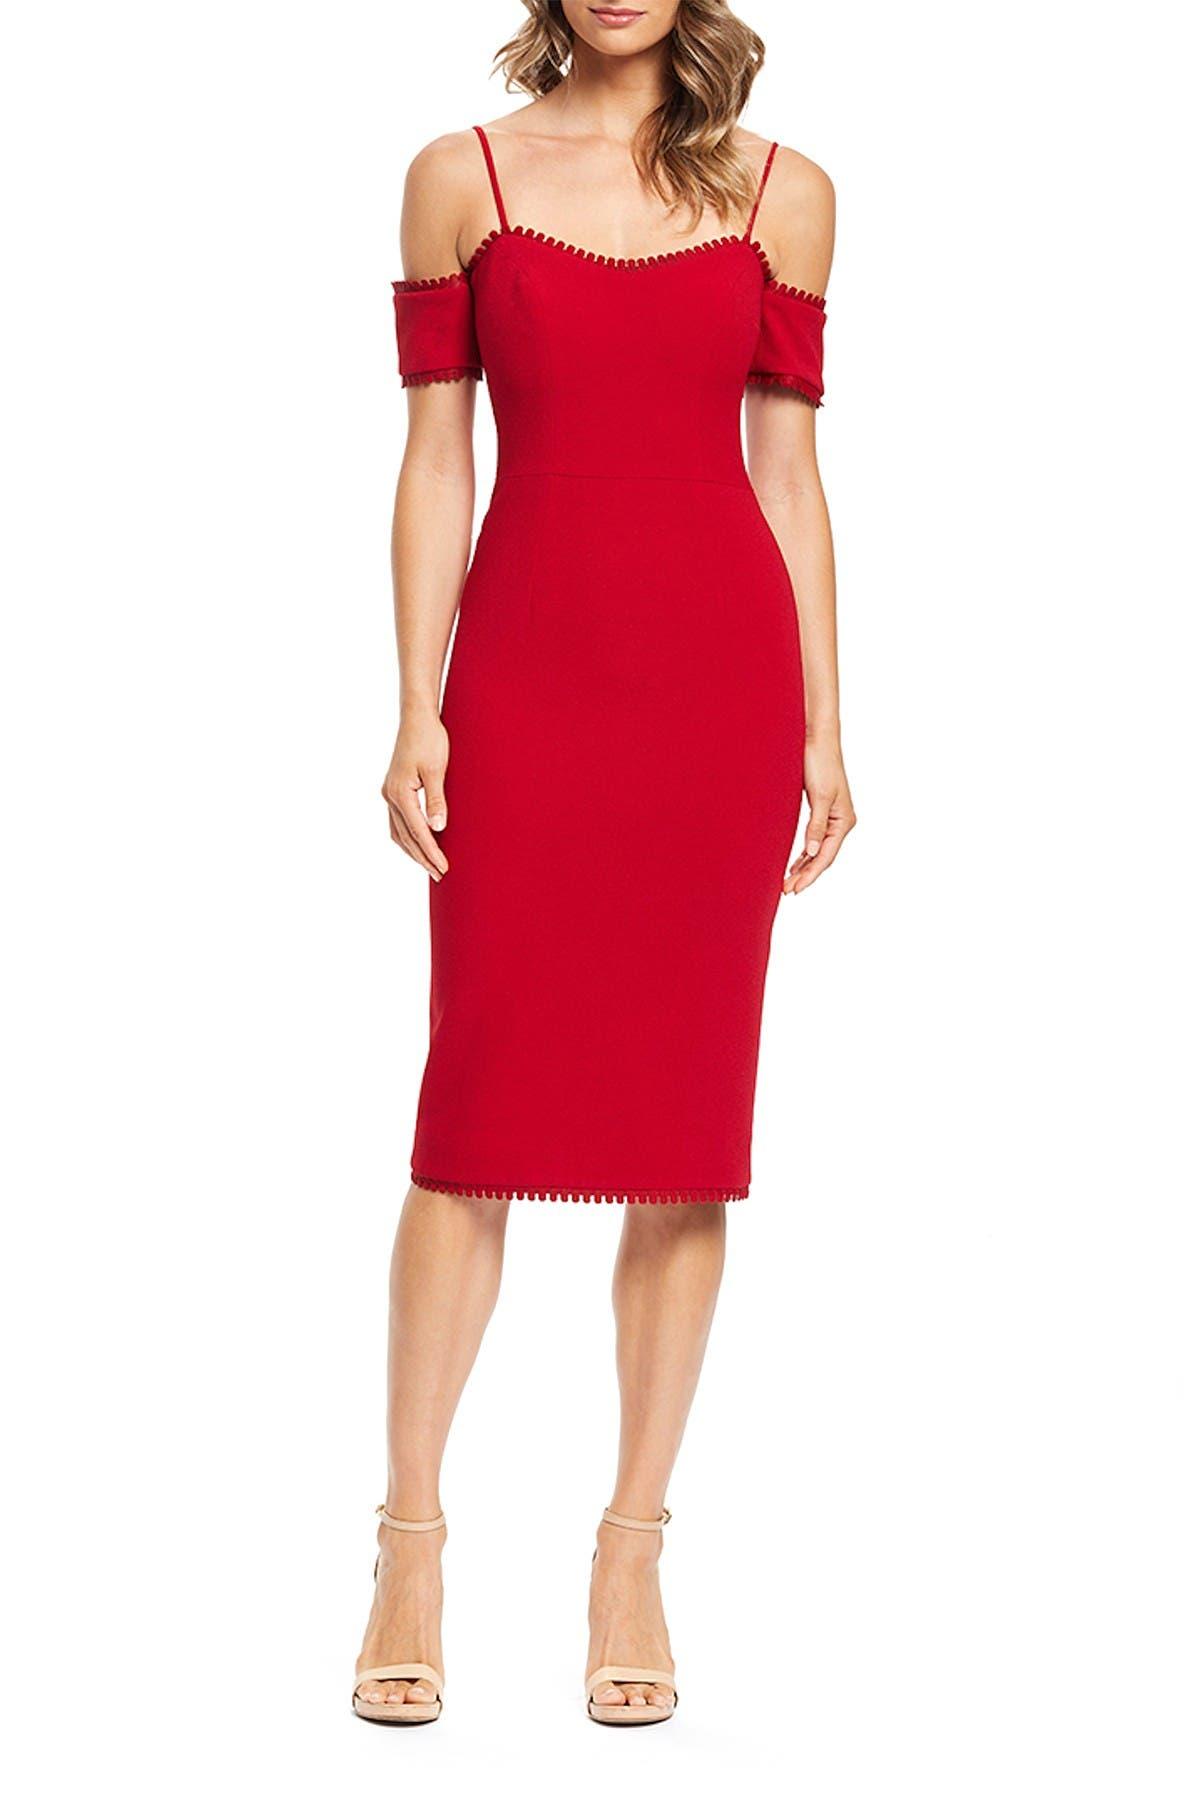 Image of Dress the Population Adrian Cold Shoulder Midi Dress